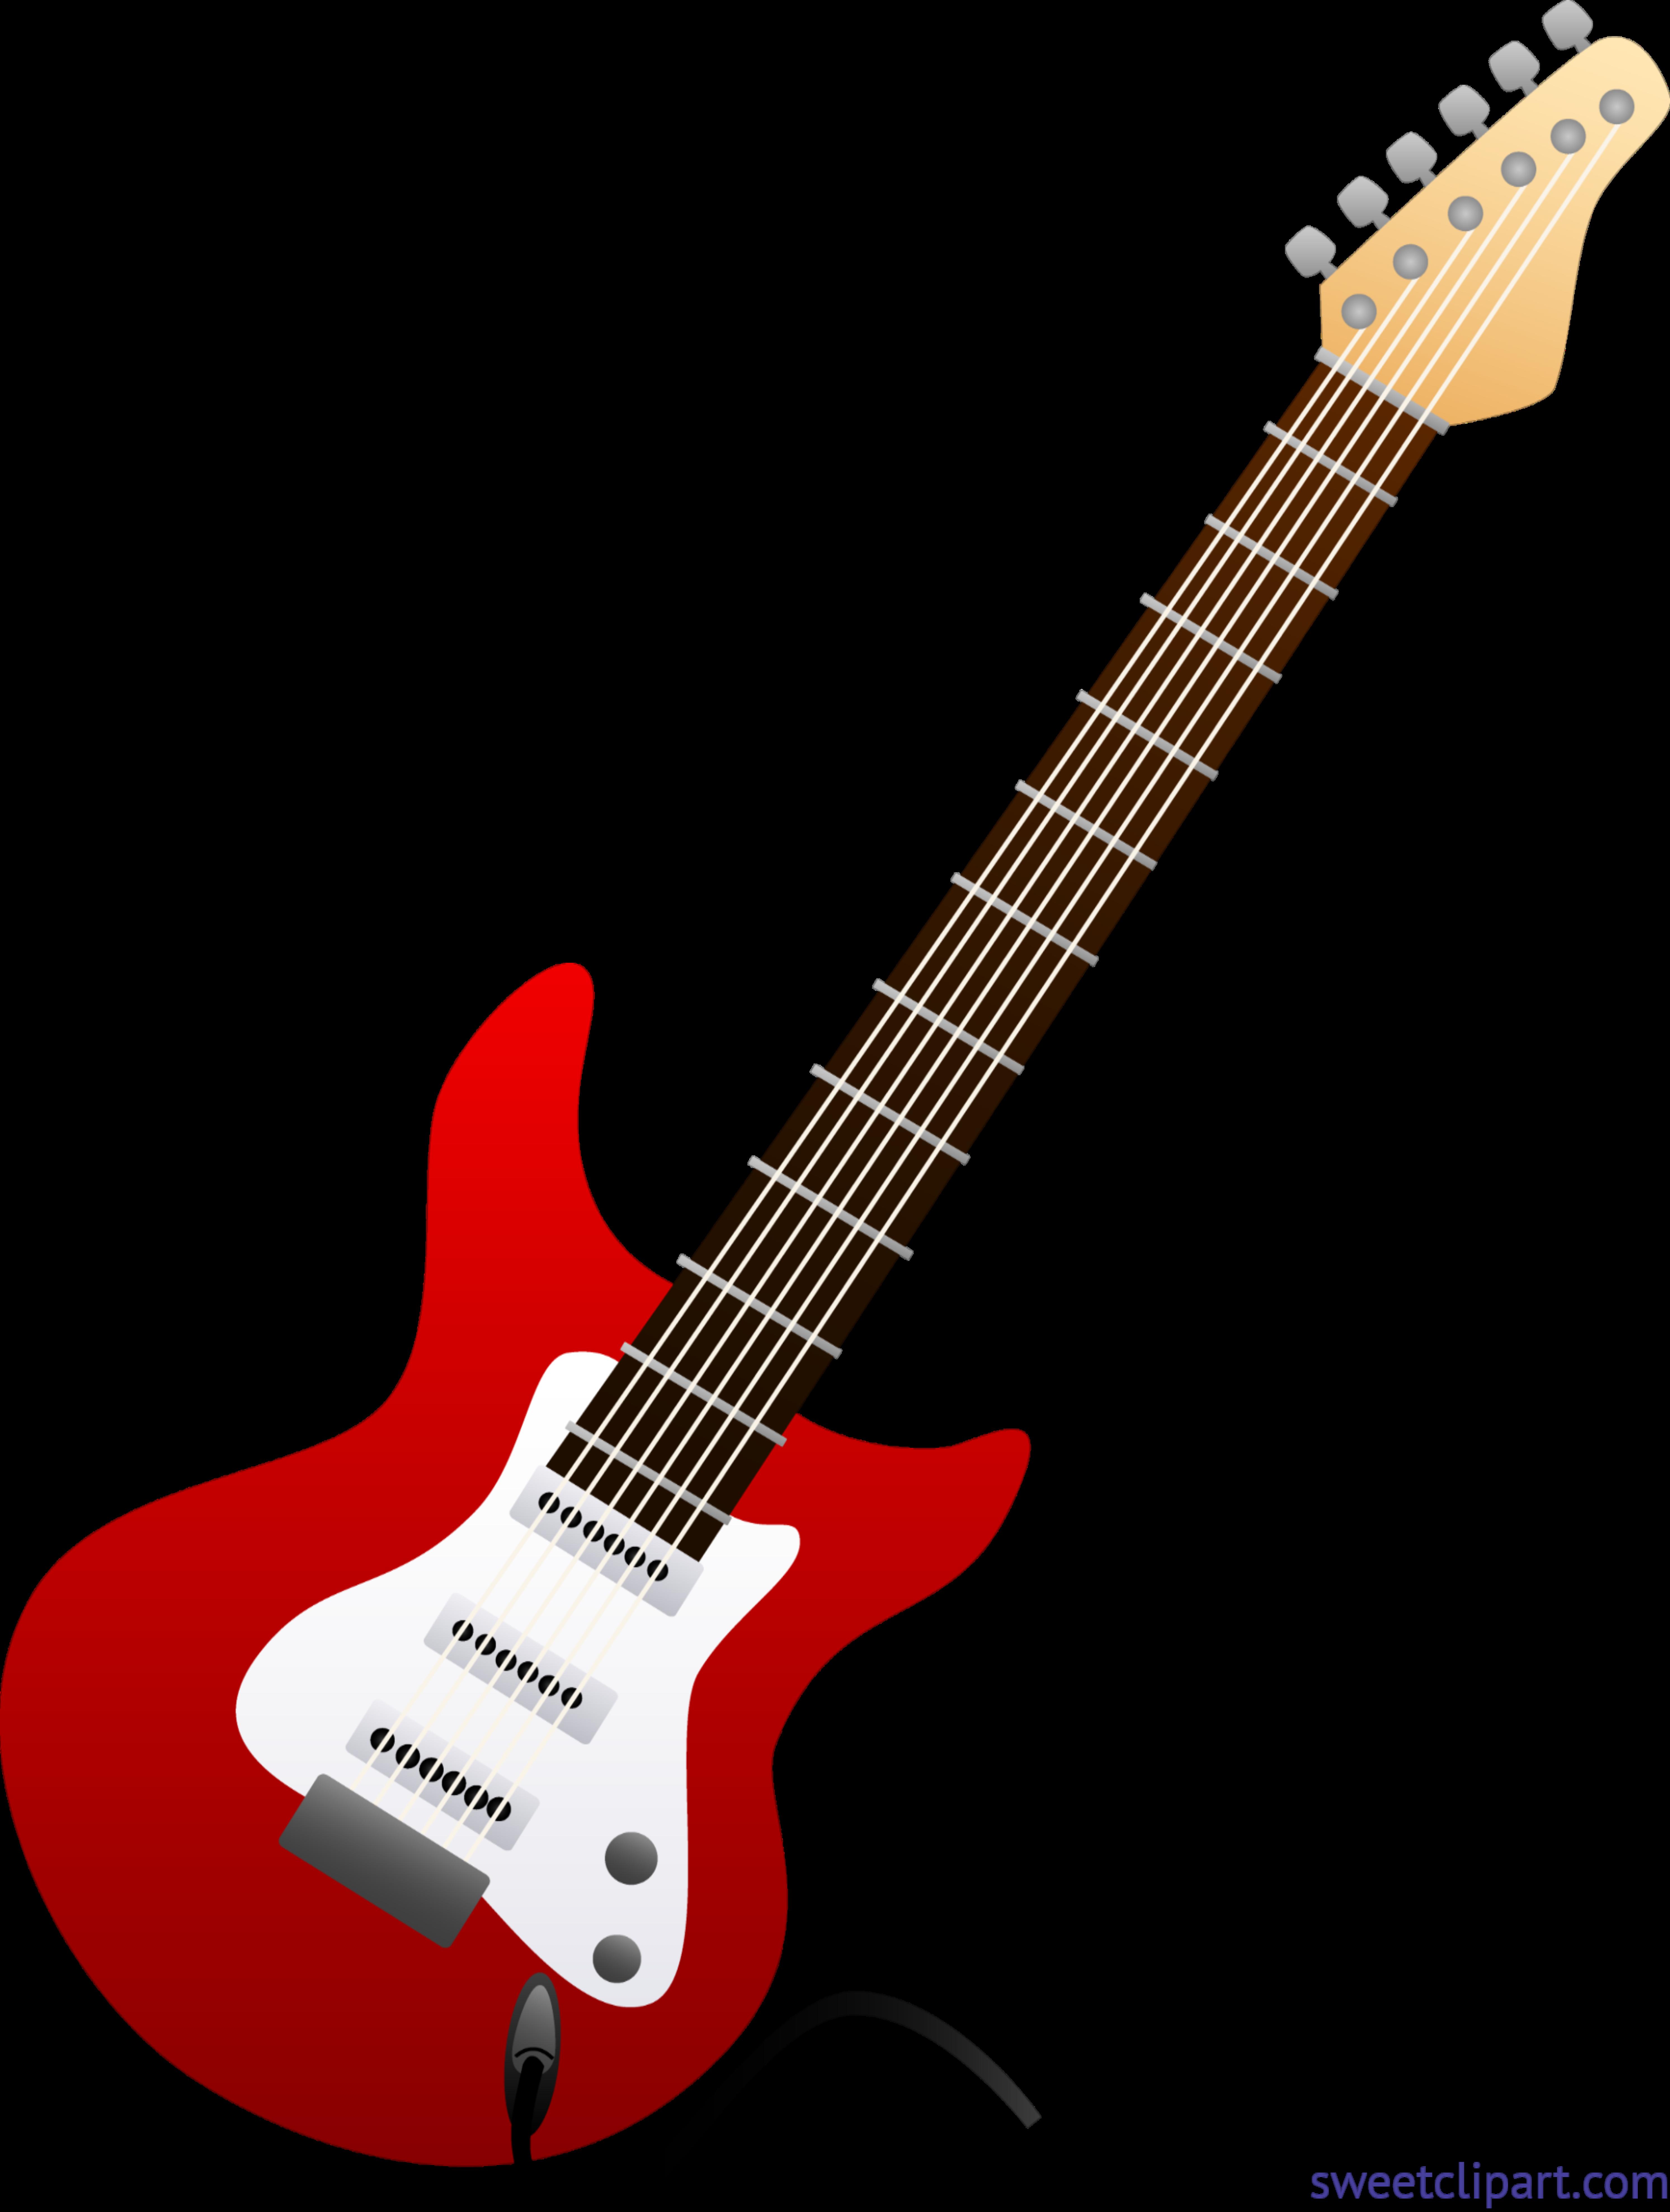 image transparent download Guitar clipart cute. Electric red clip art